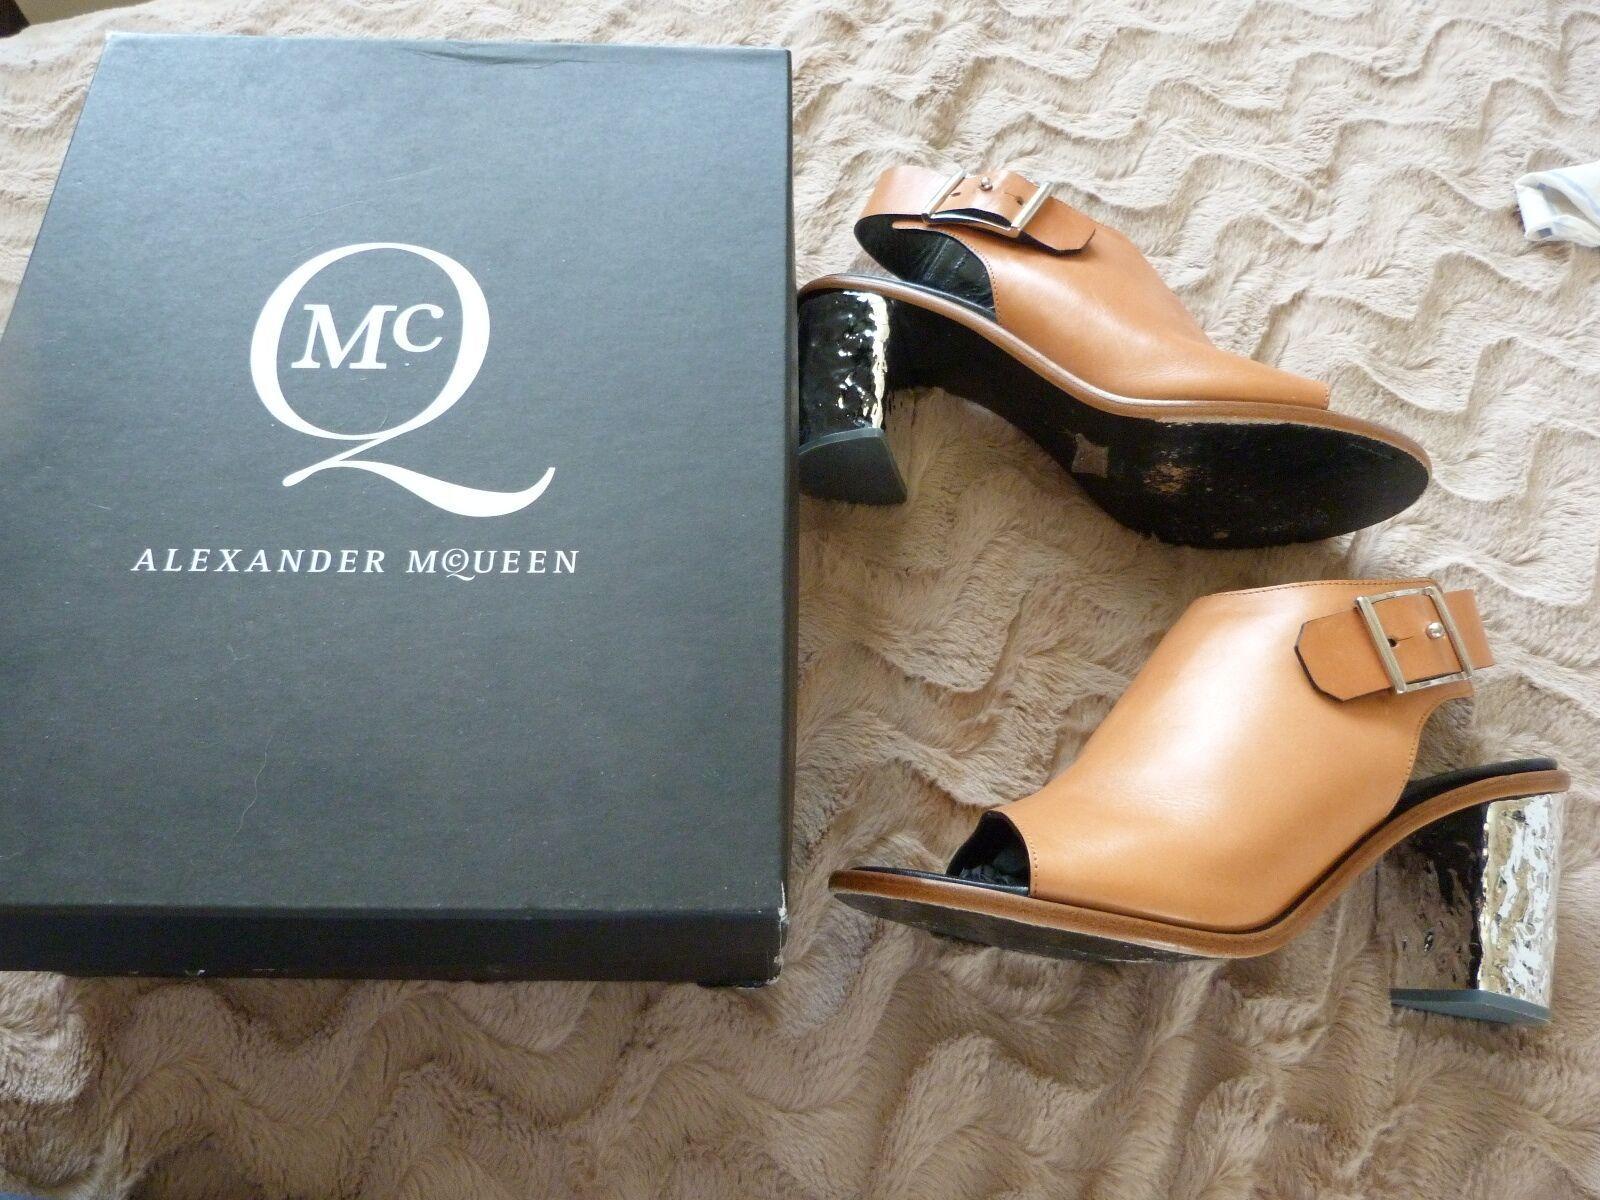 ALEXANDER McQUEEN TAN LEATHER UNUSUAL HEEL SANDALS 7 / Schuhe .. UK 7 SANDALS  EU 40  US 9 a0cd27